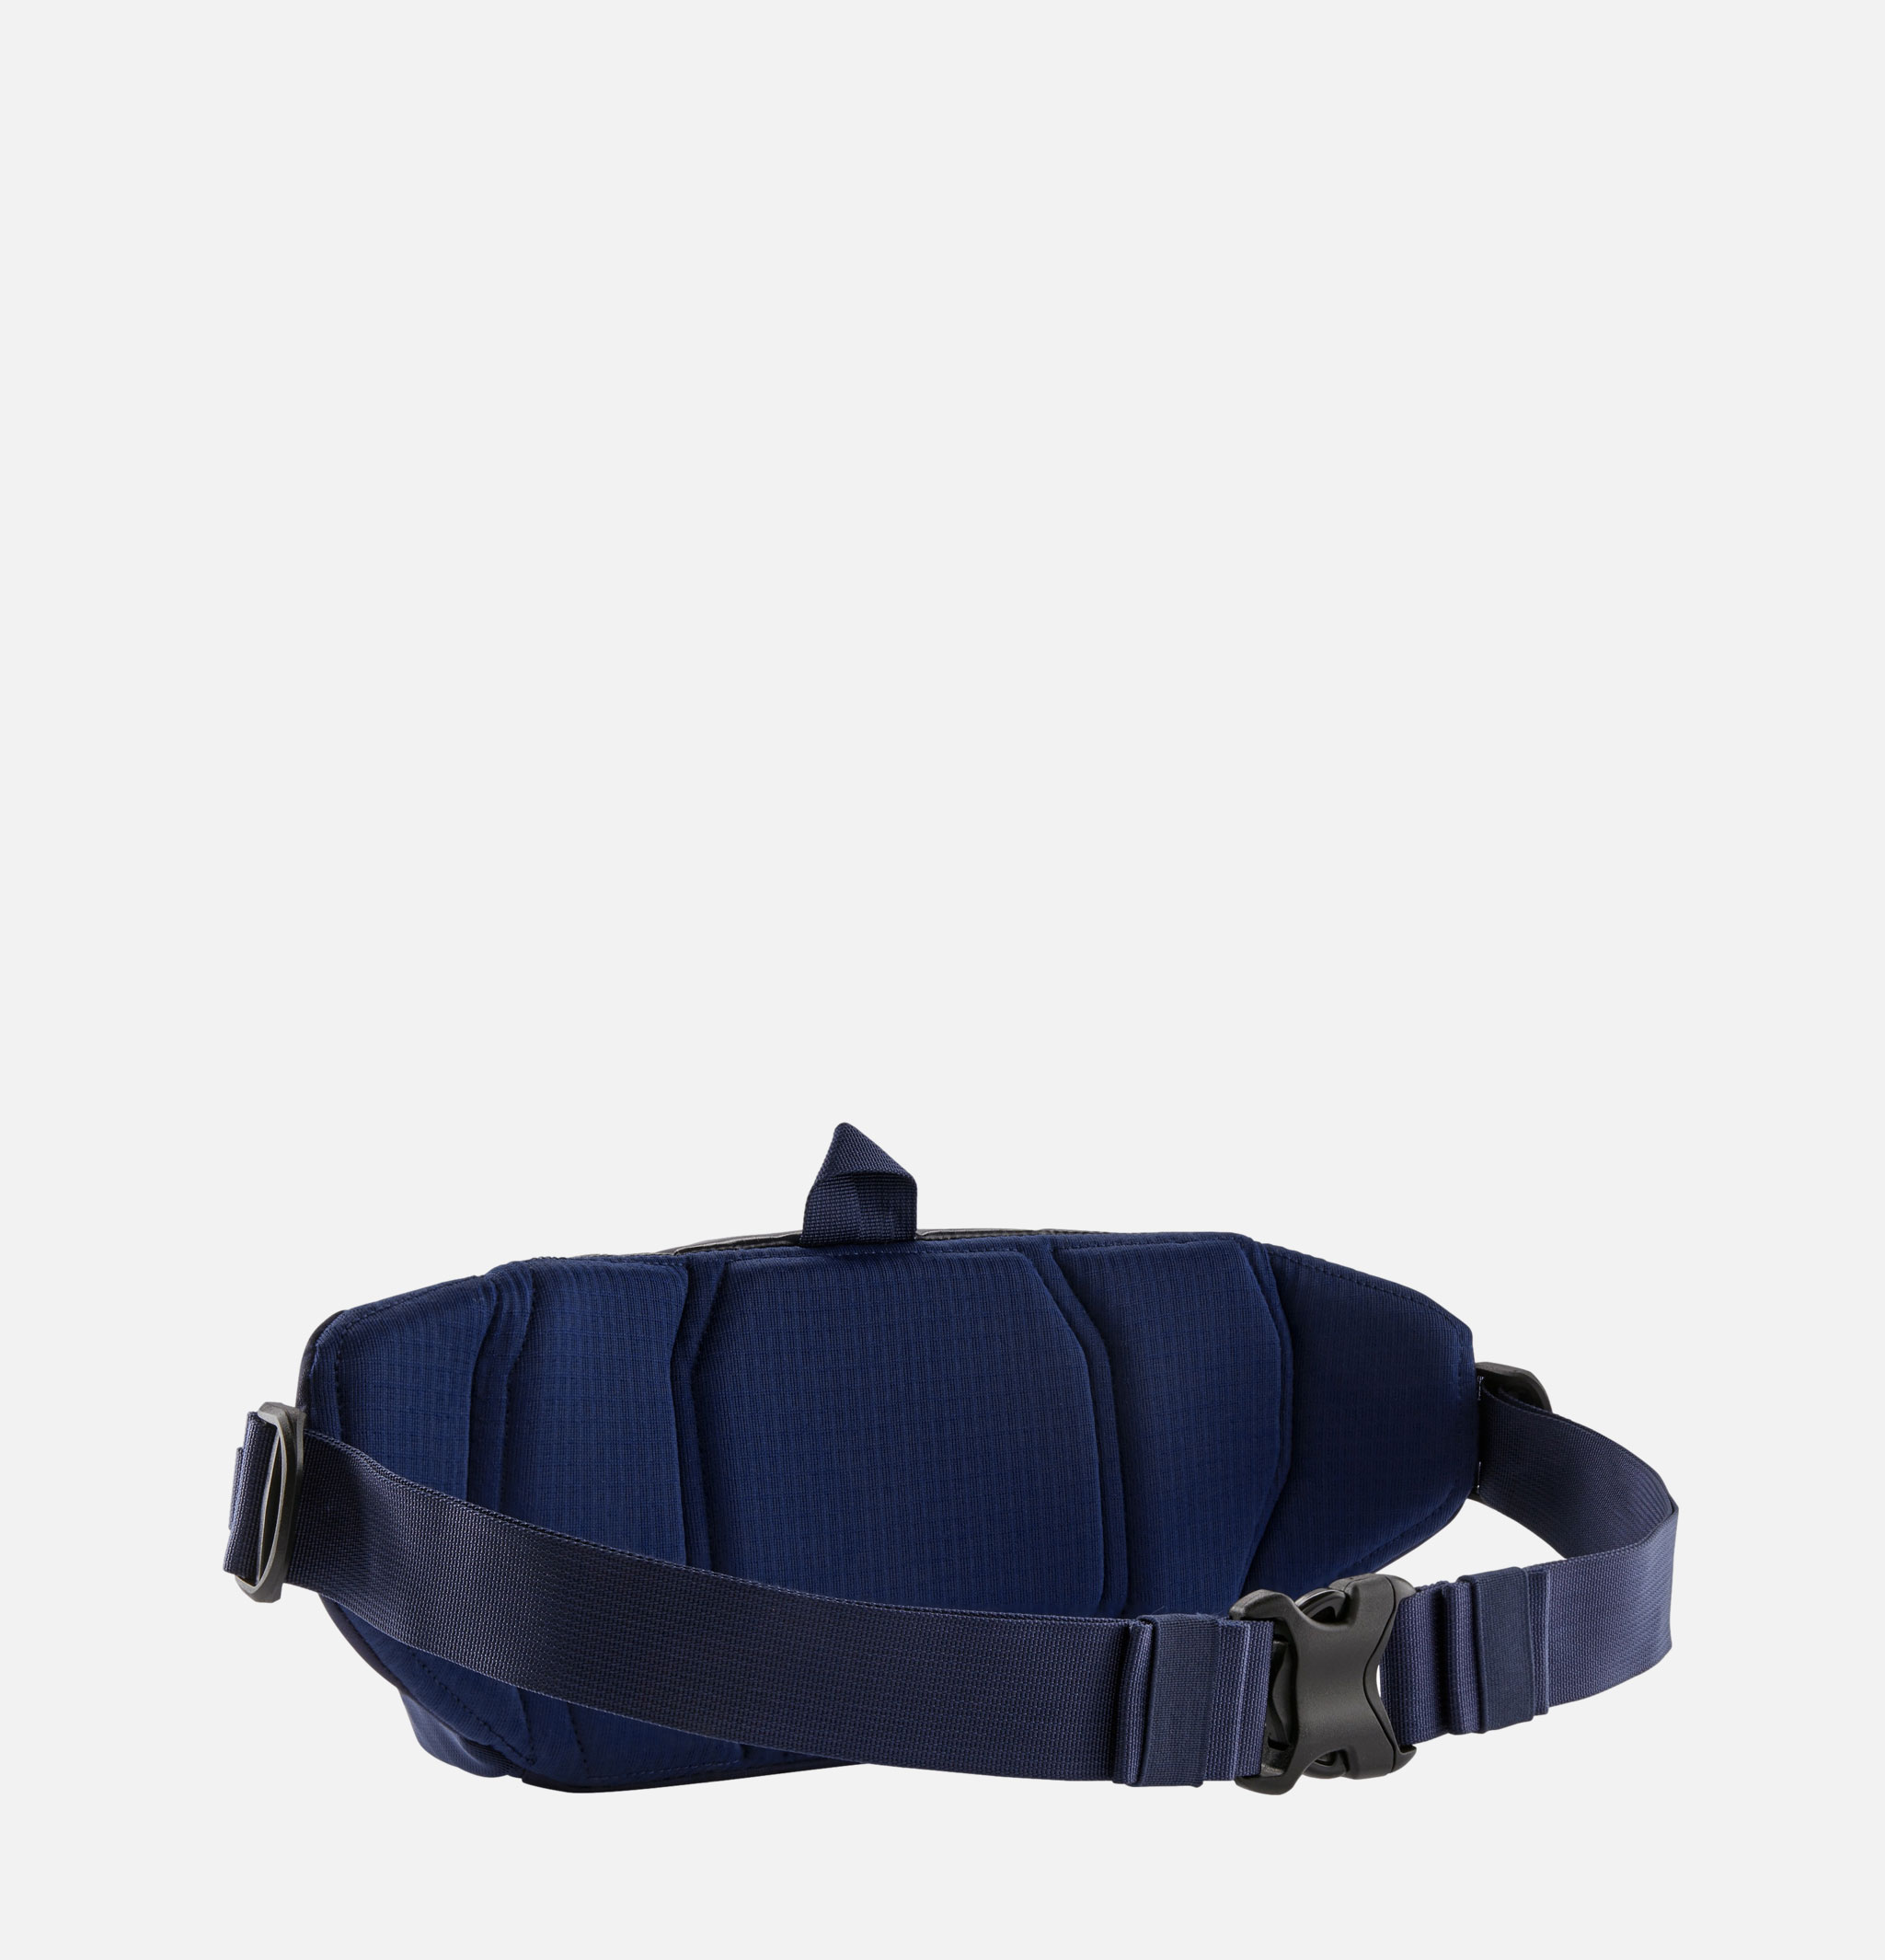 Blackhole Waist Pack 5L Navy